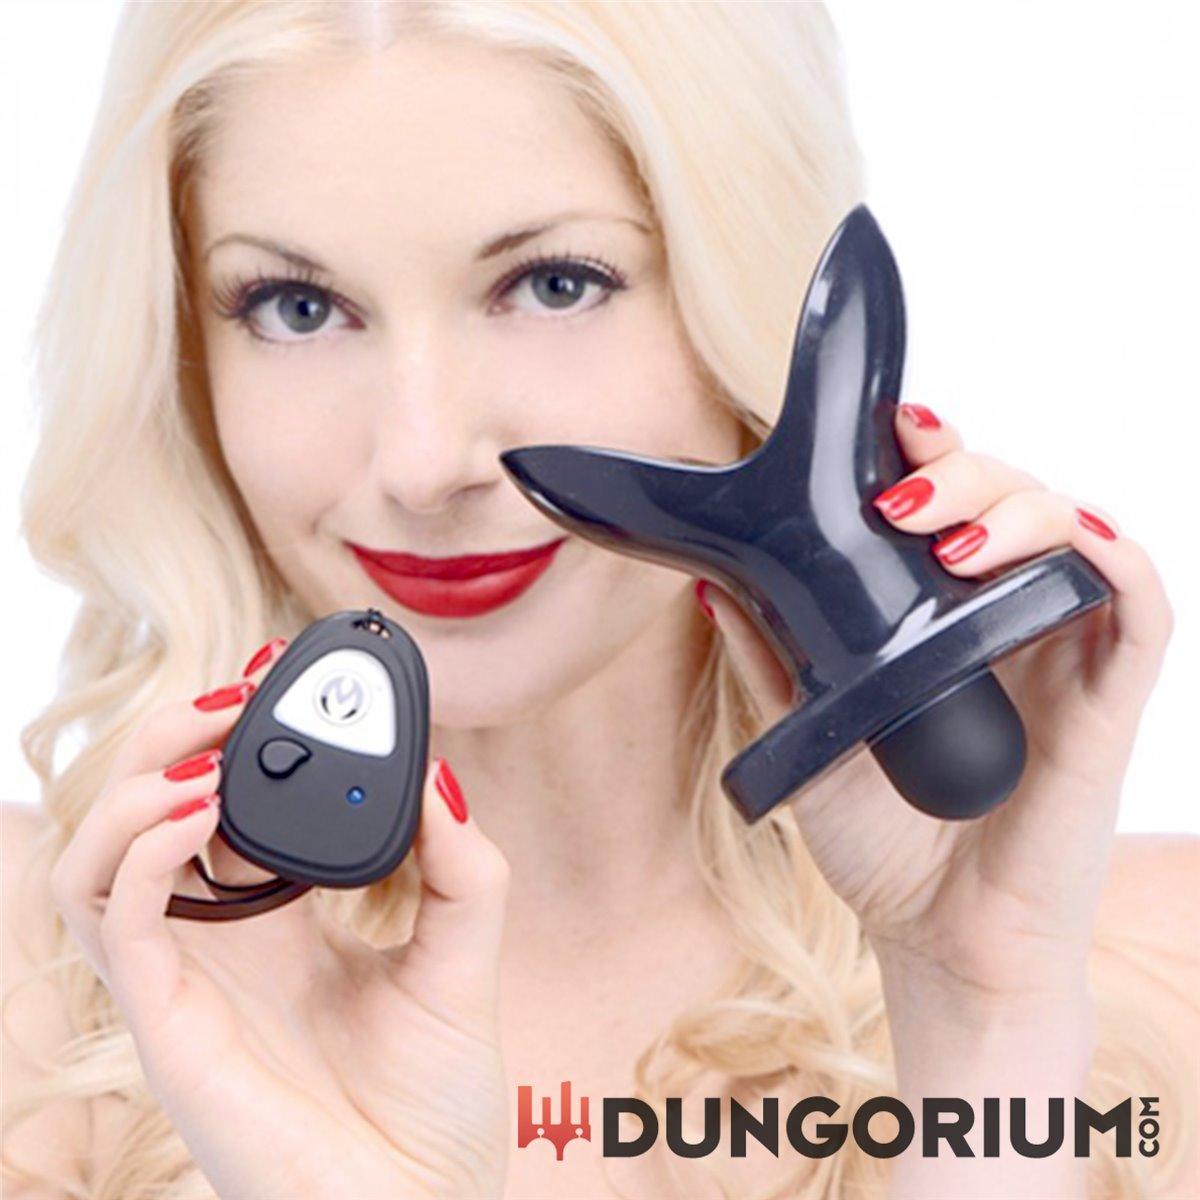 swingerclub limbacher hof deutscher dirty talk porno